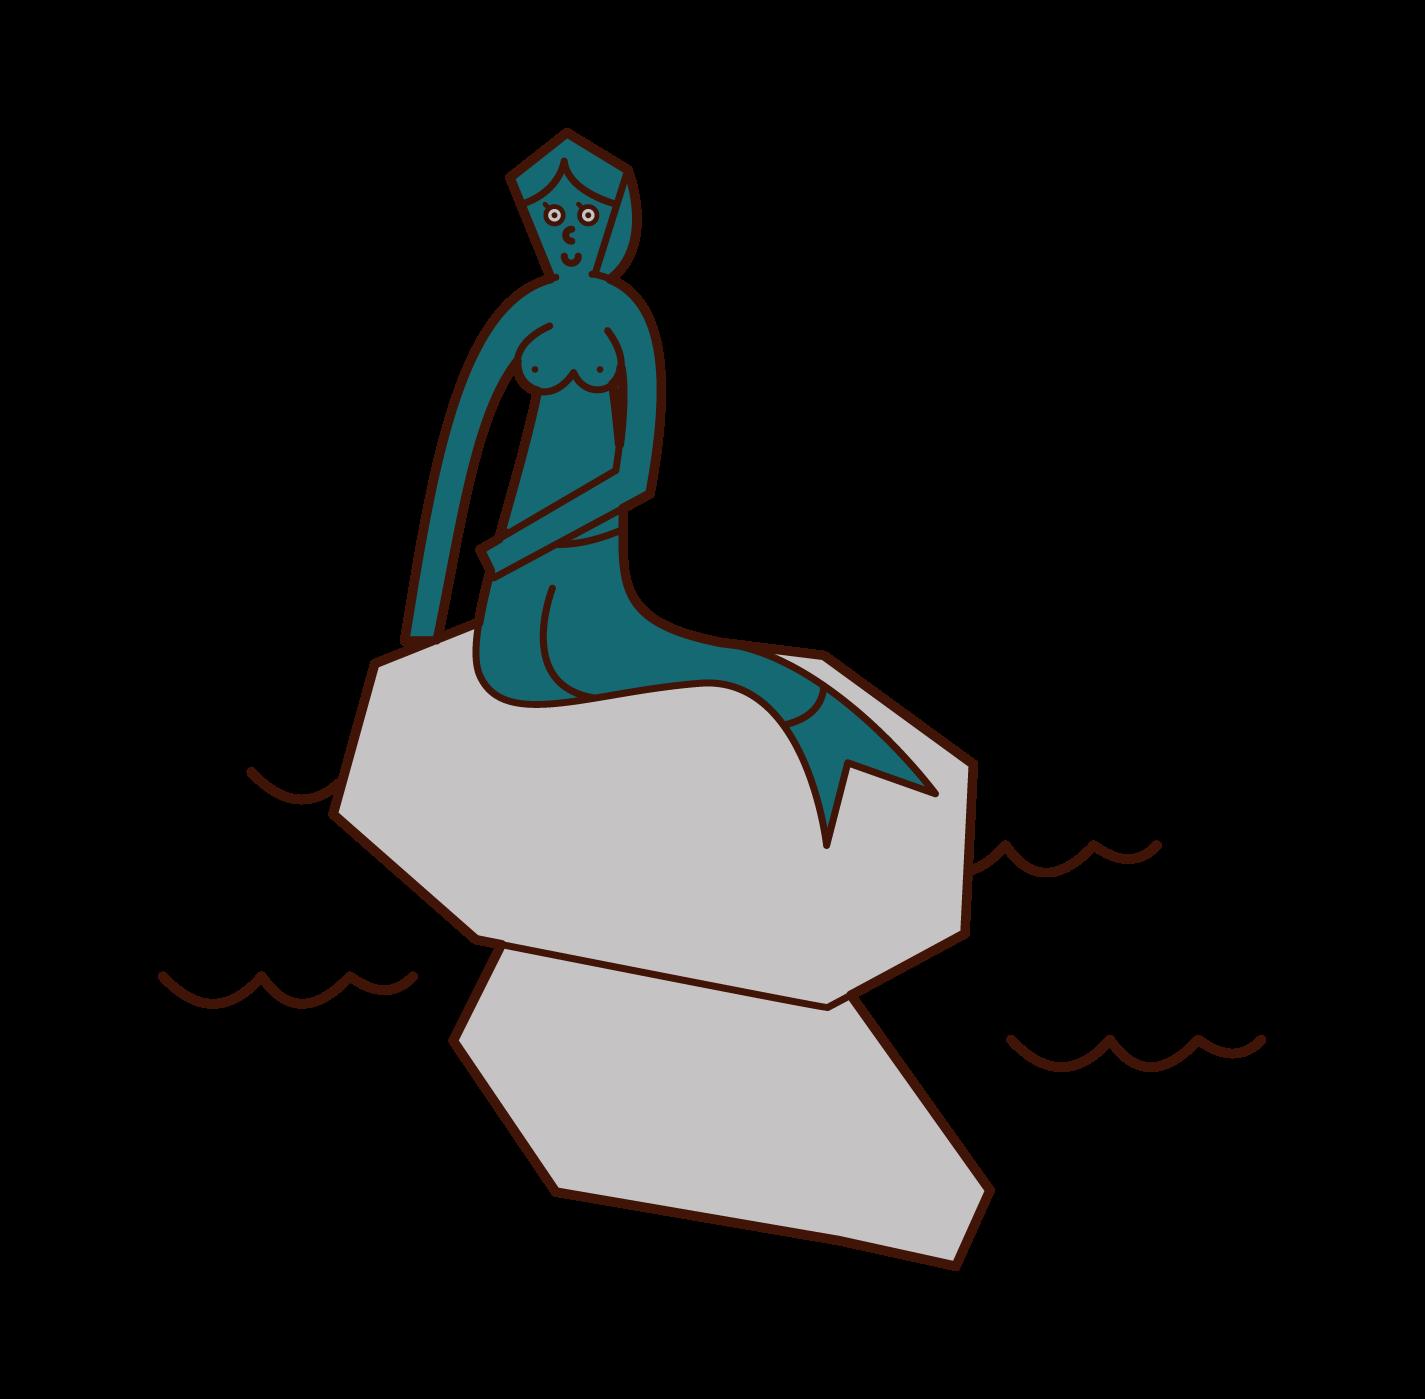 Illustration of the mermaid princess statue